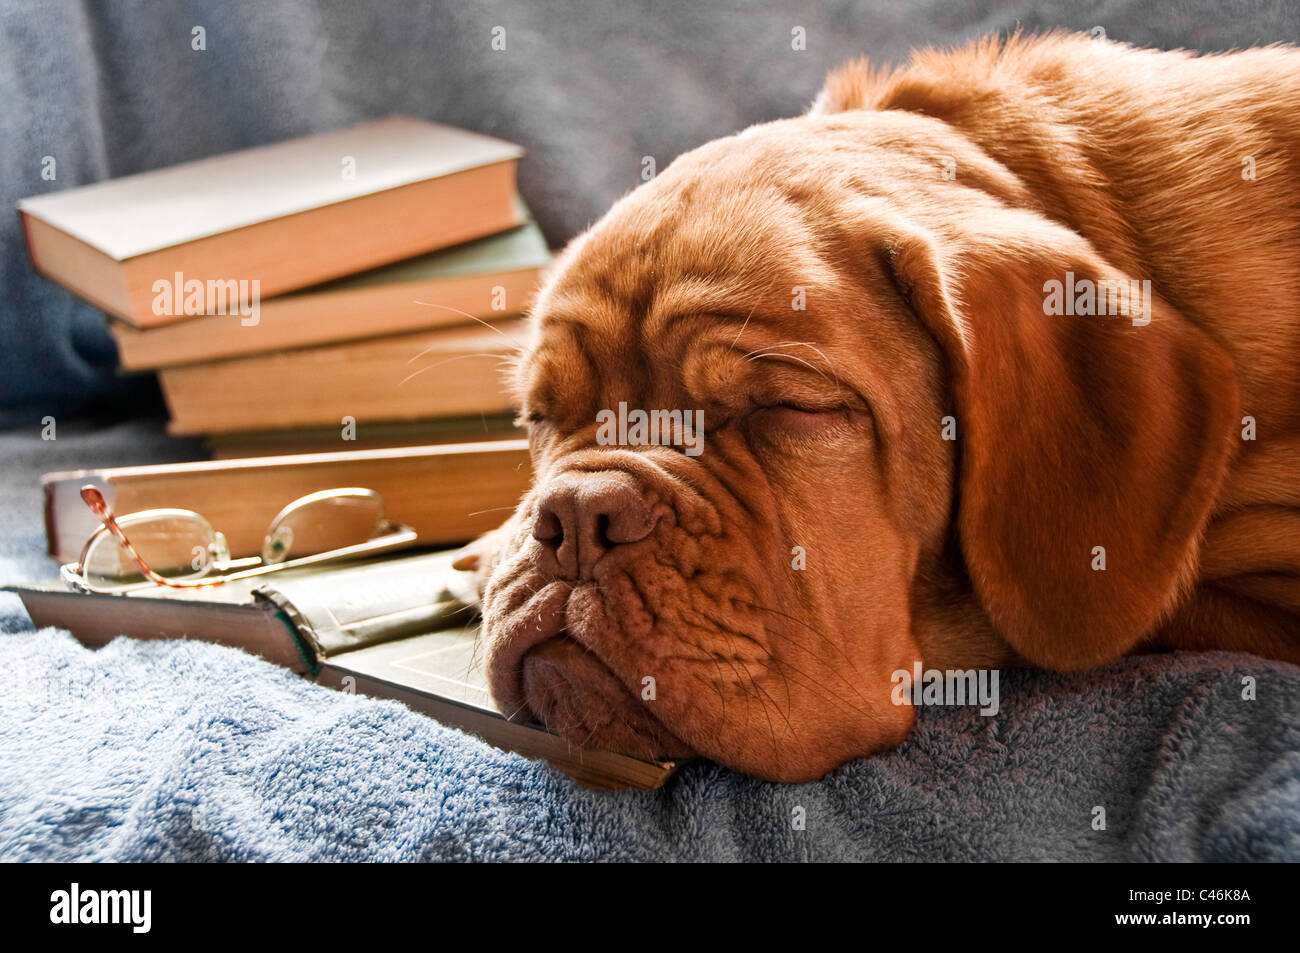 puppy sleeping books stock photos & puppy sleeping books stock